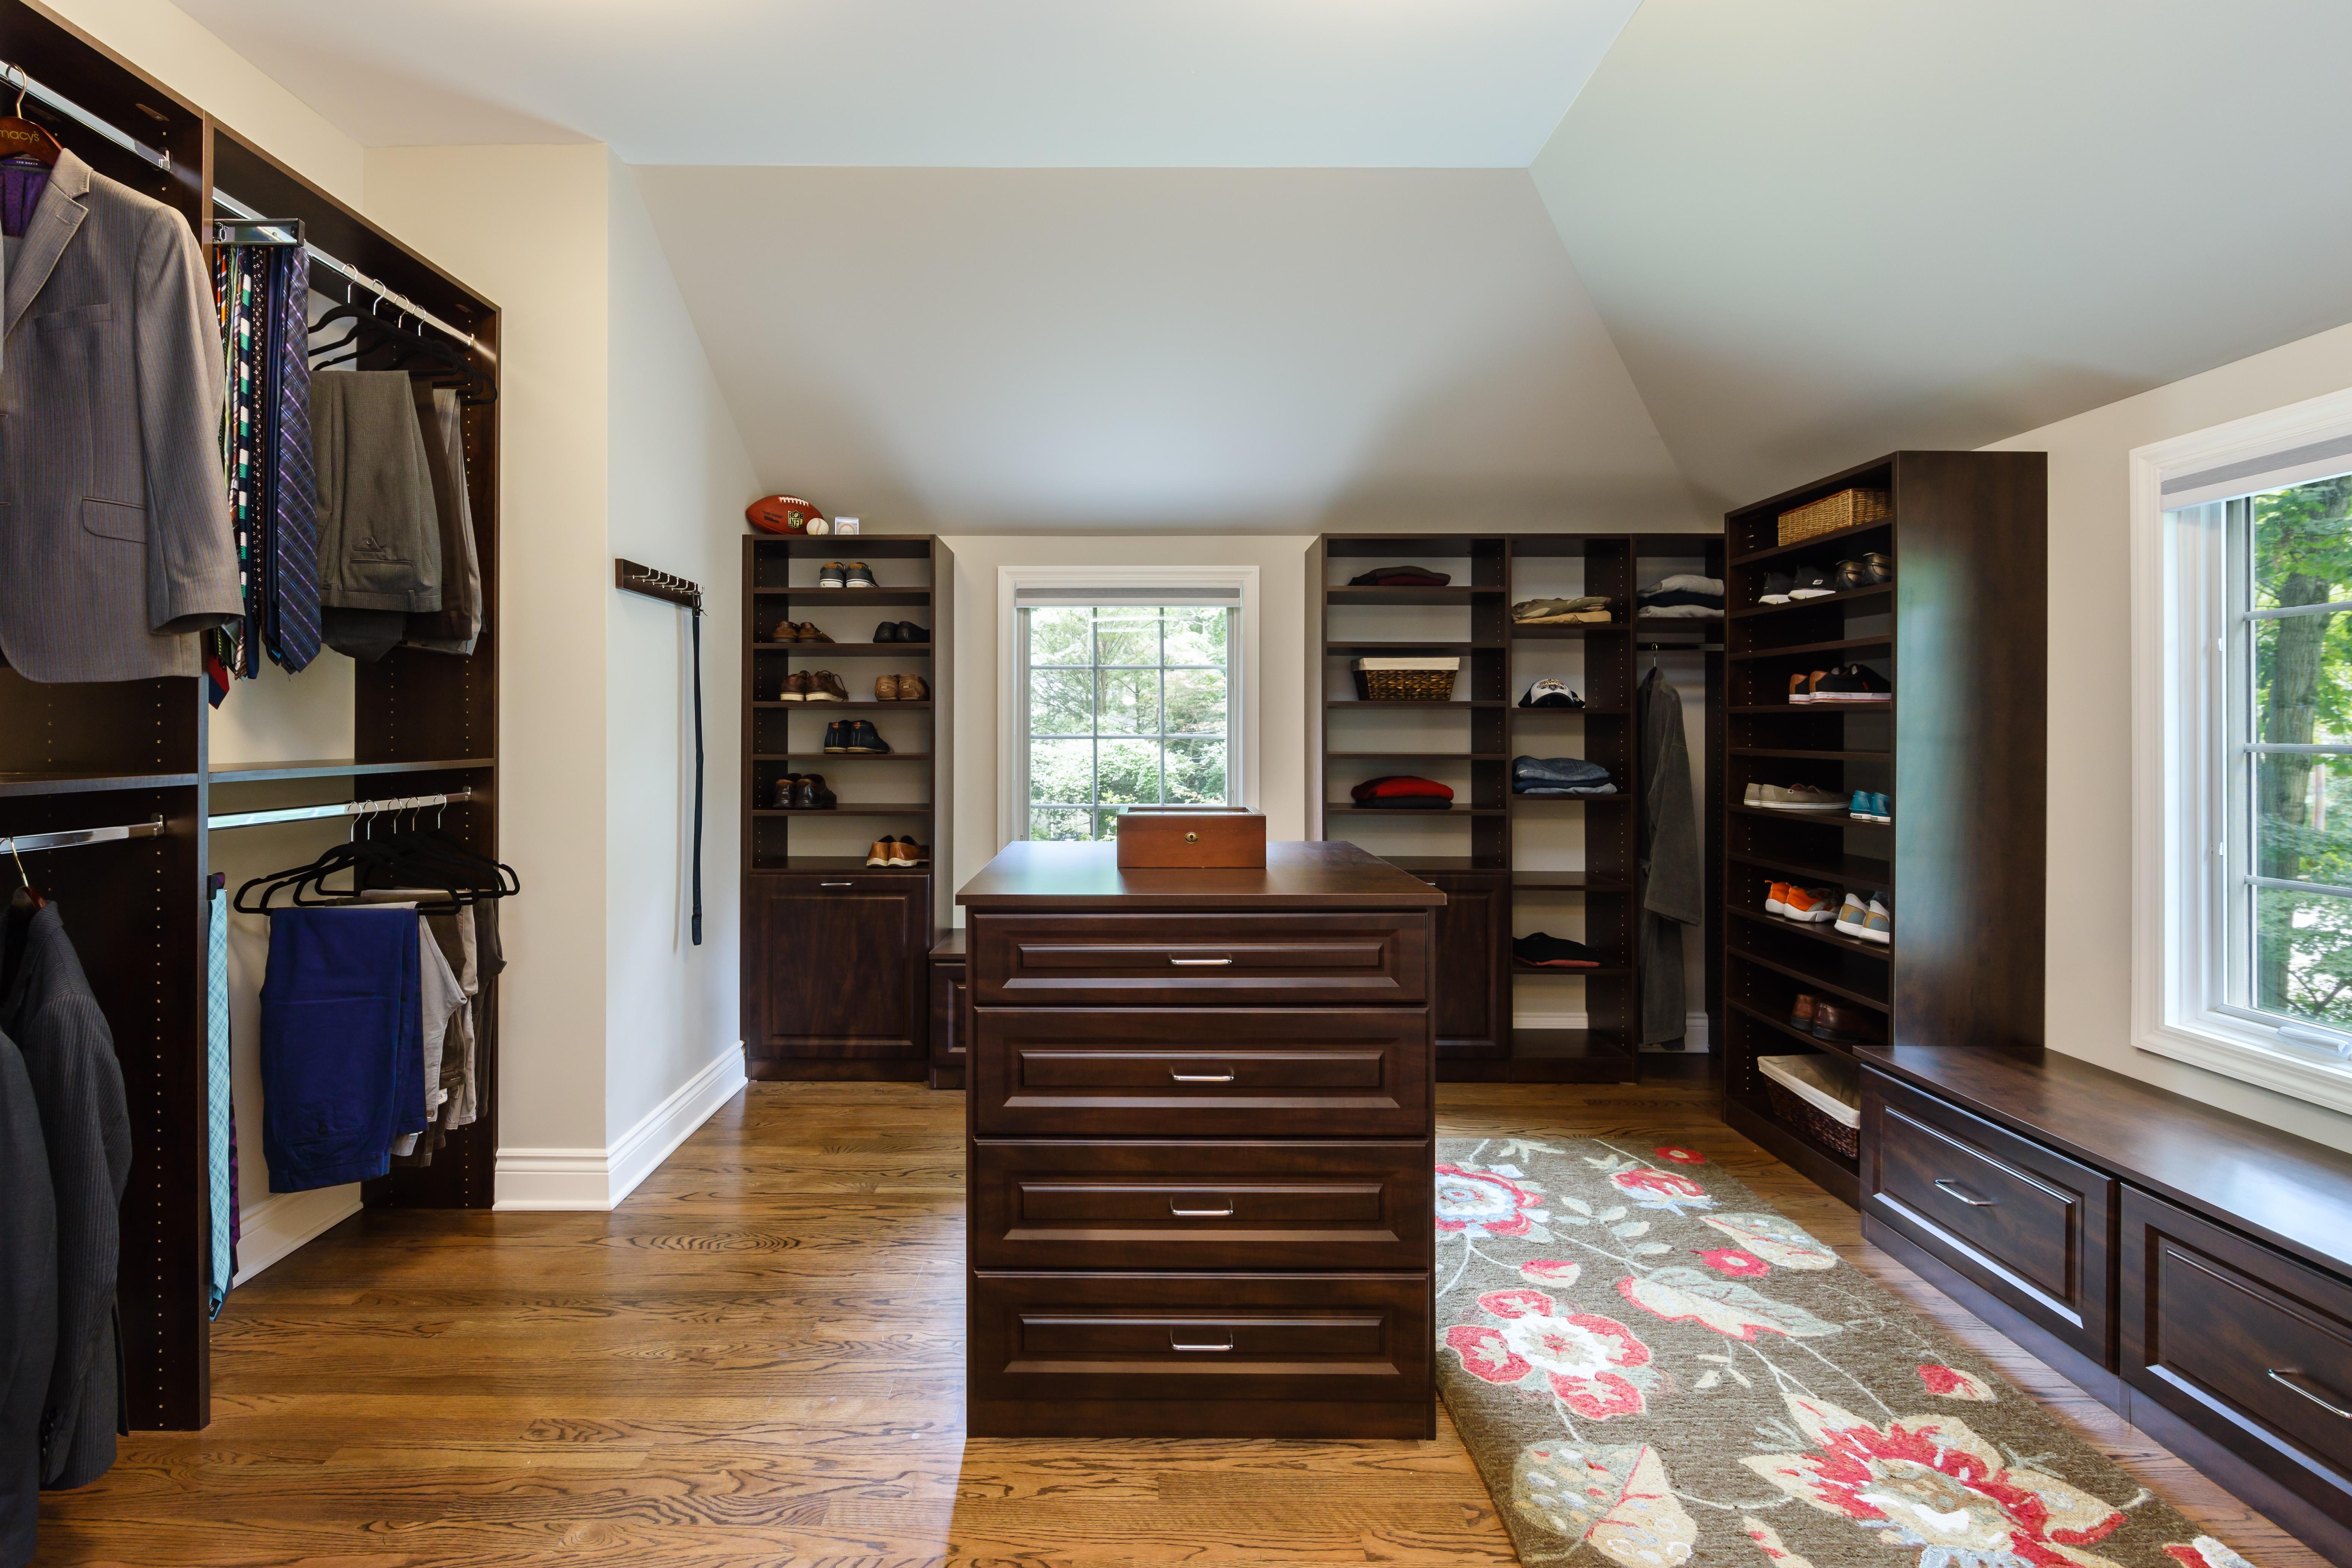 Symmetry Closets custom wardrobe, Wardrobe closet, closet island, master walk-in, his master closet